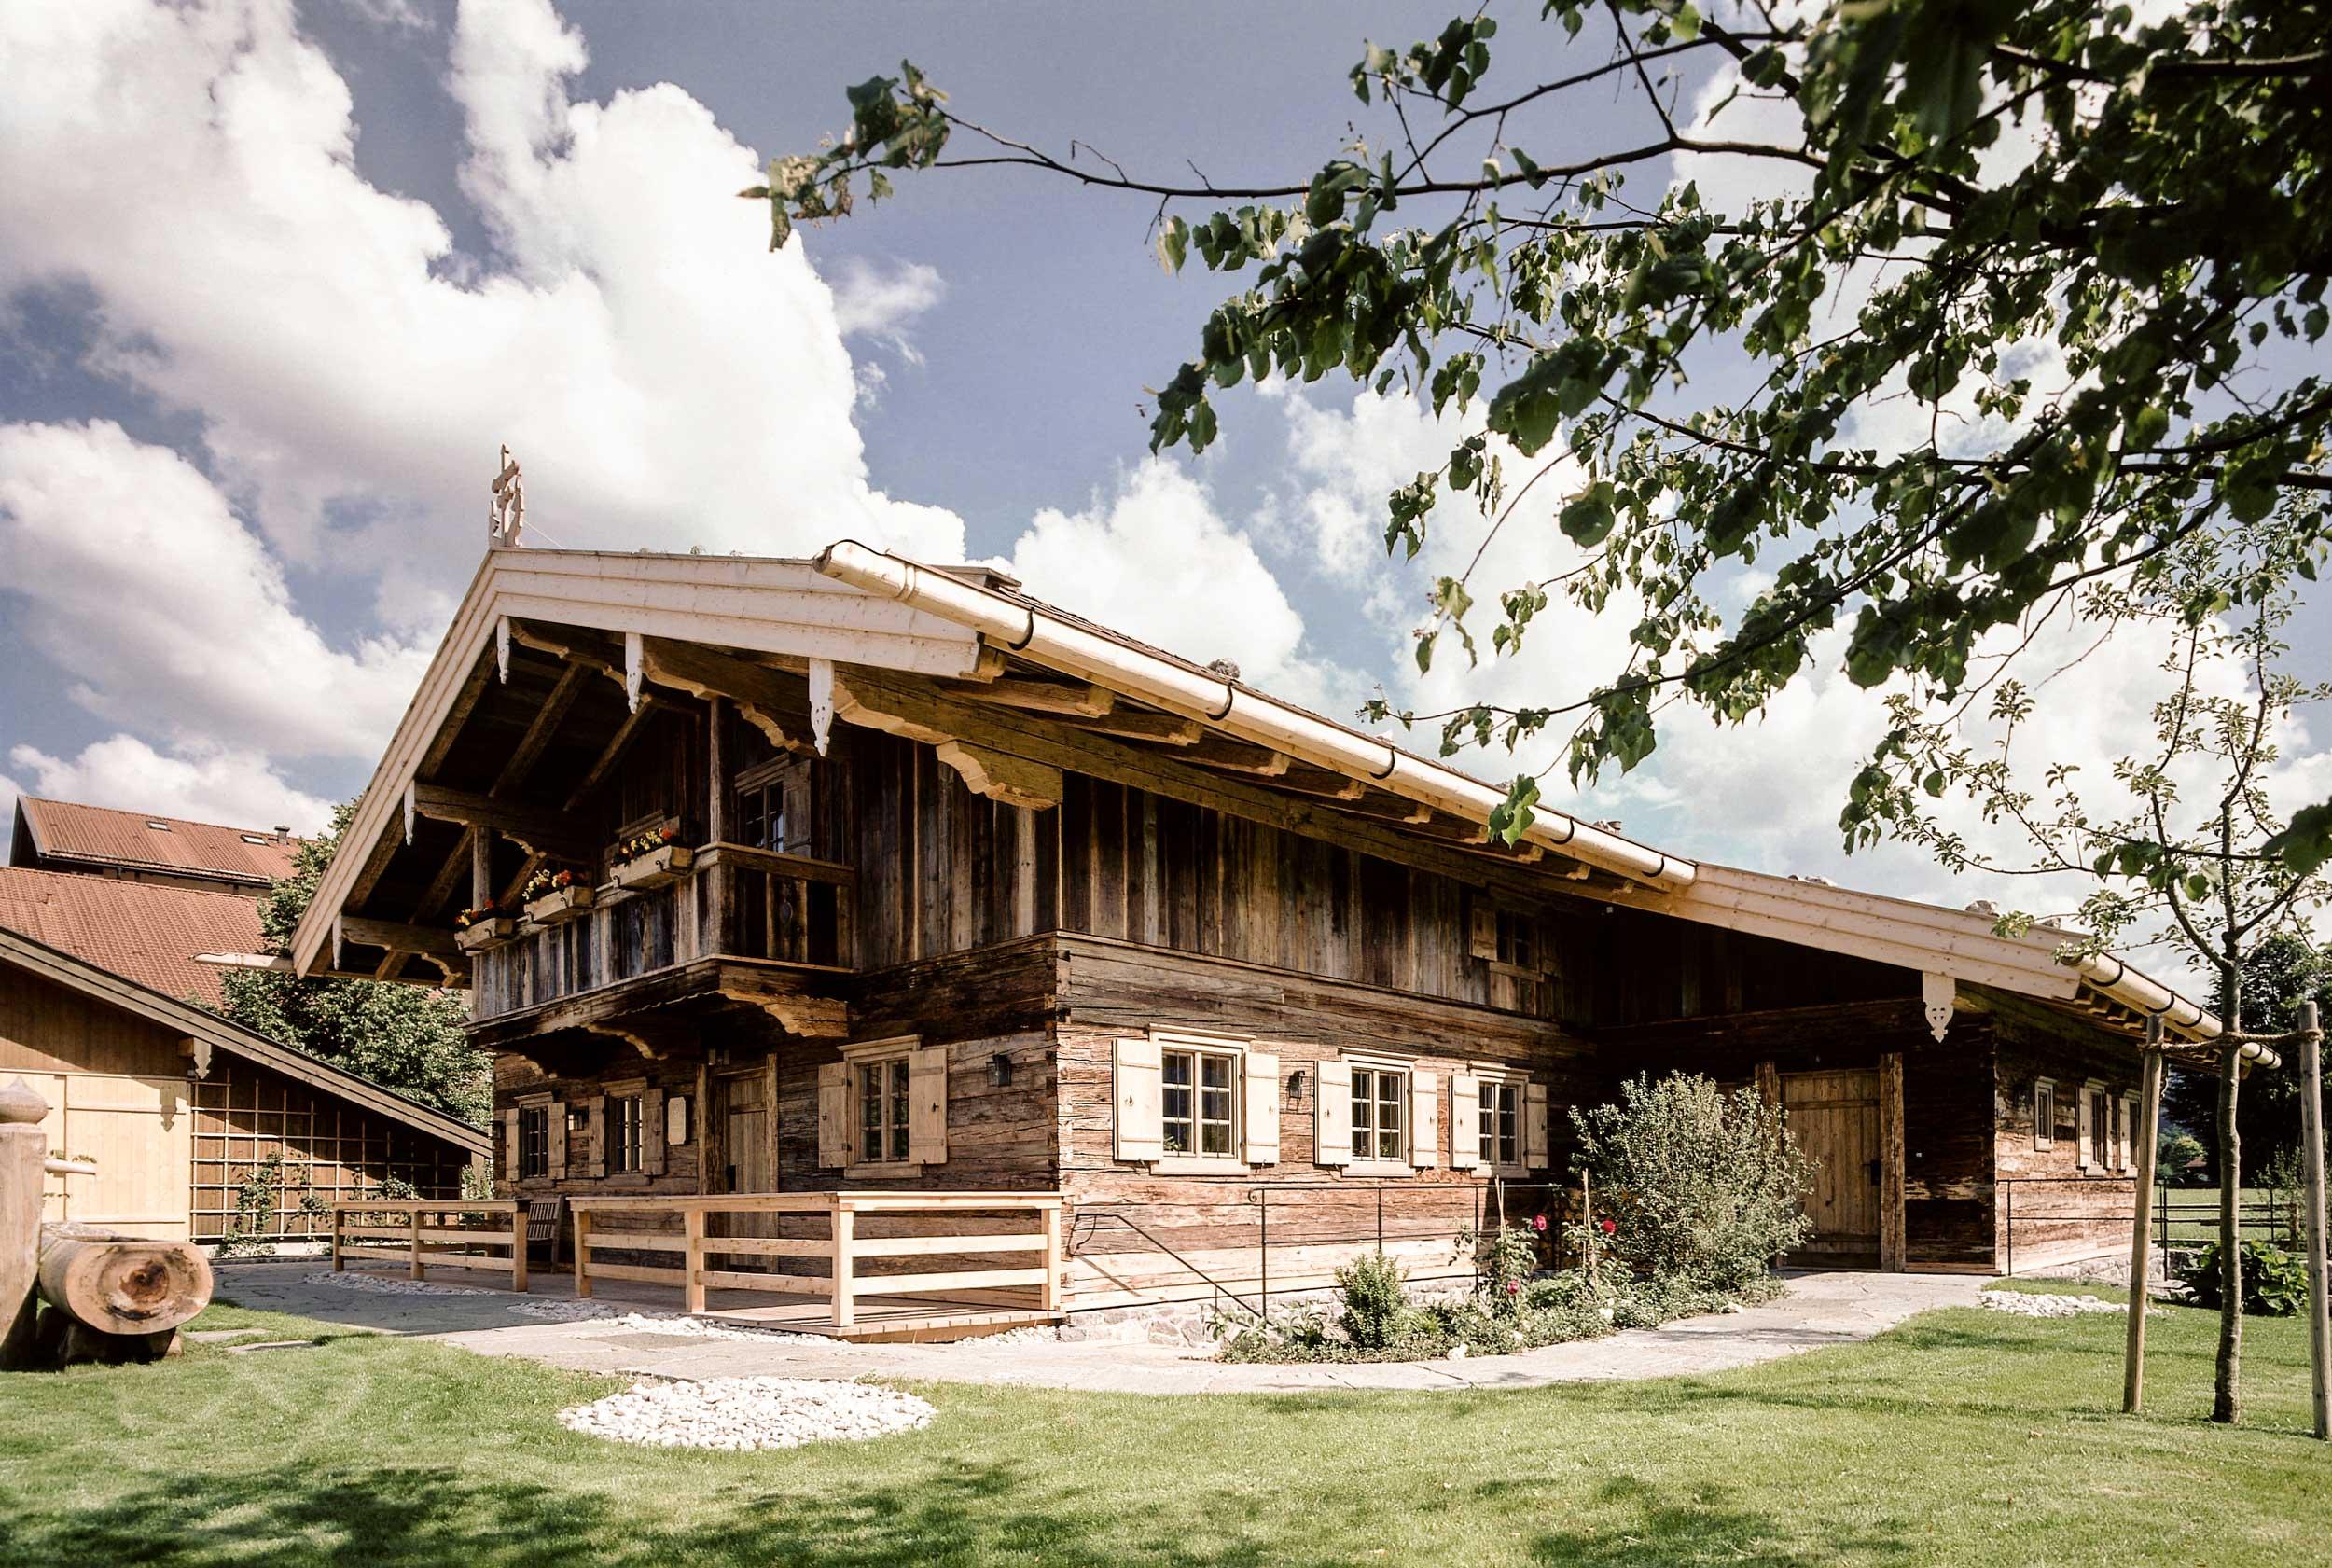 zimmerei-stoib-holzbau-holzhaus-egerner-höfe-alm-blockbau-altholz-innenausbau-tegernsee-rottach-egern-07.jpg